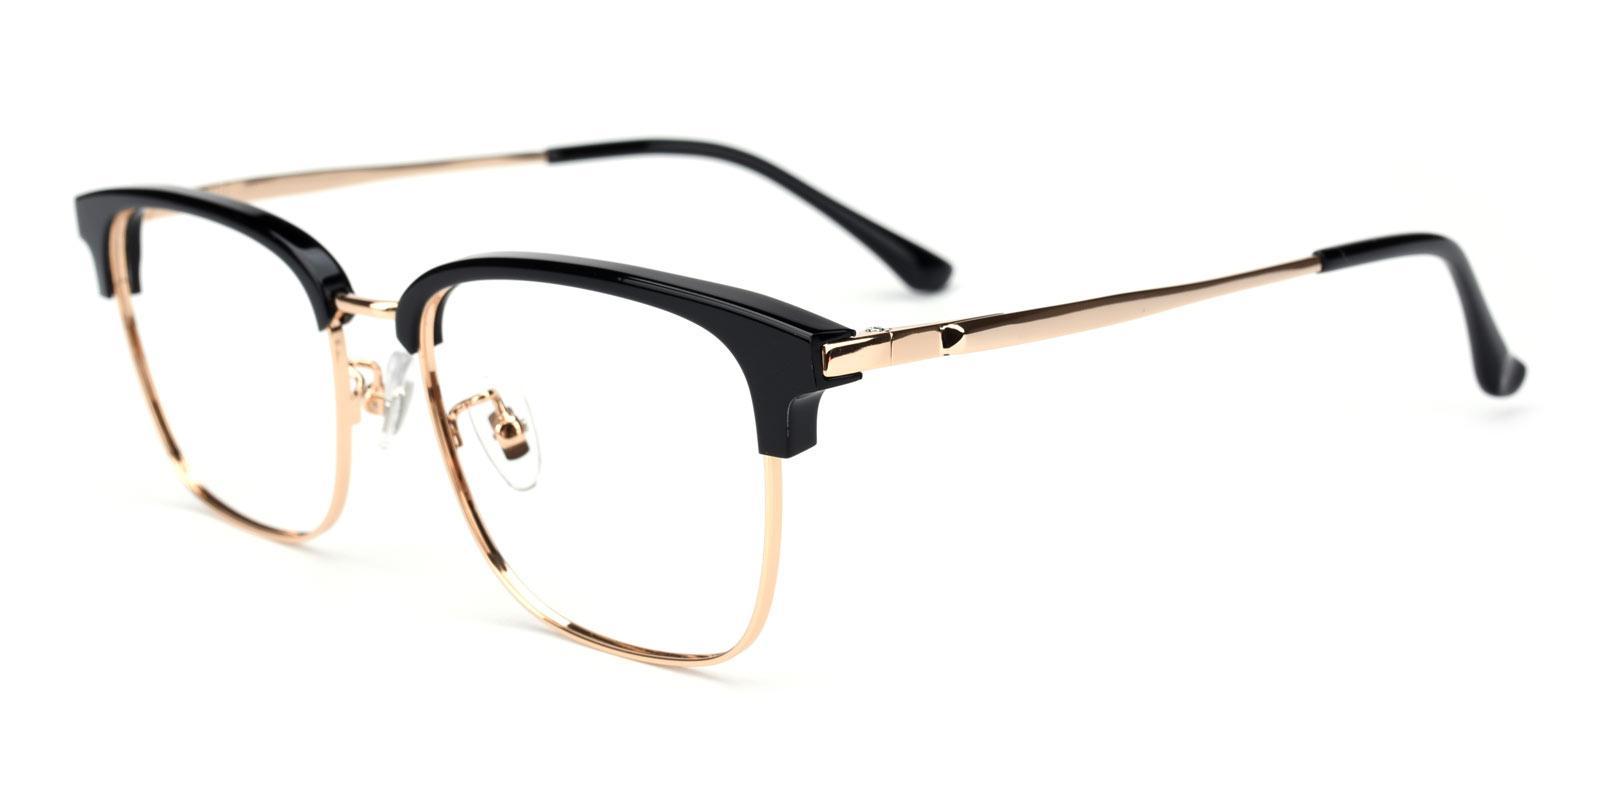 Yuri-Gold-Browline-Titanium-Eyeglasses-additional1